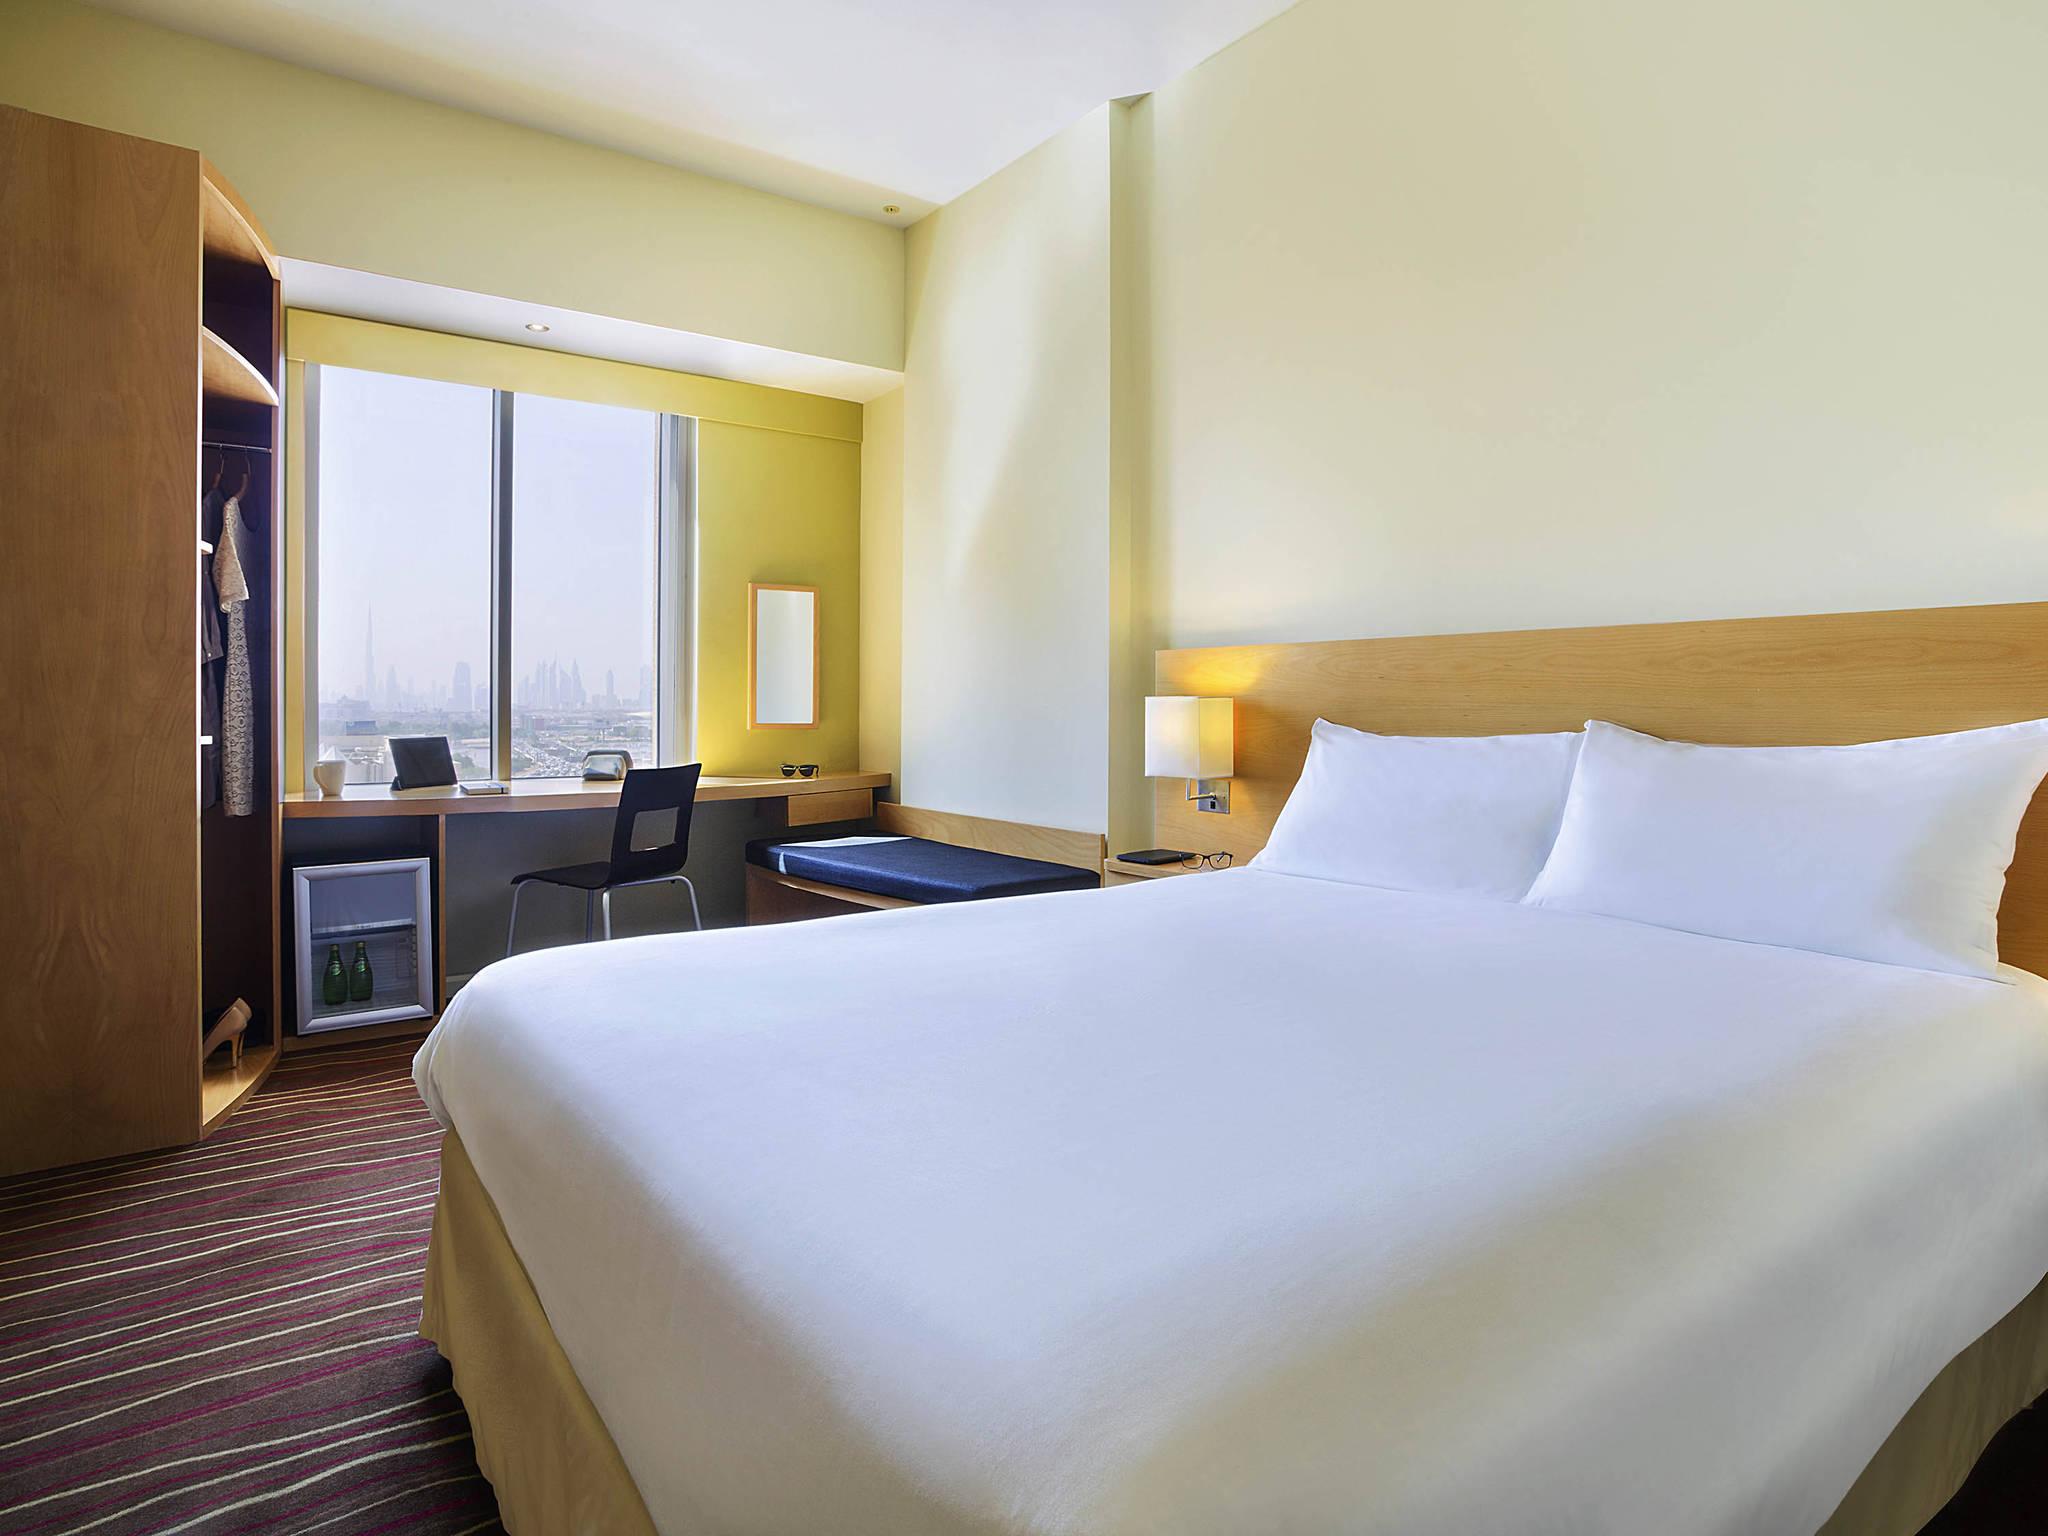 هتل دیره تون دبی